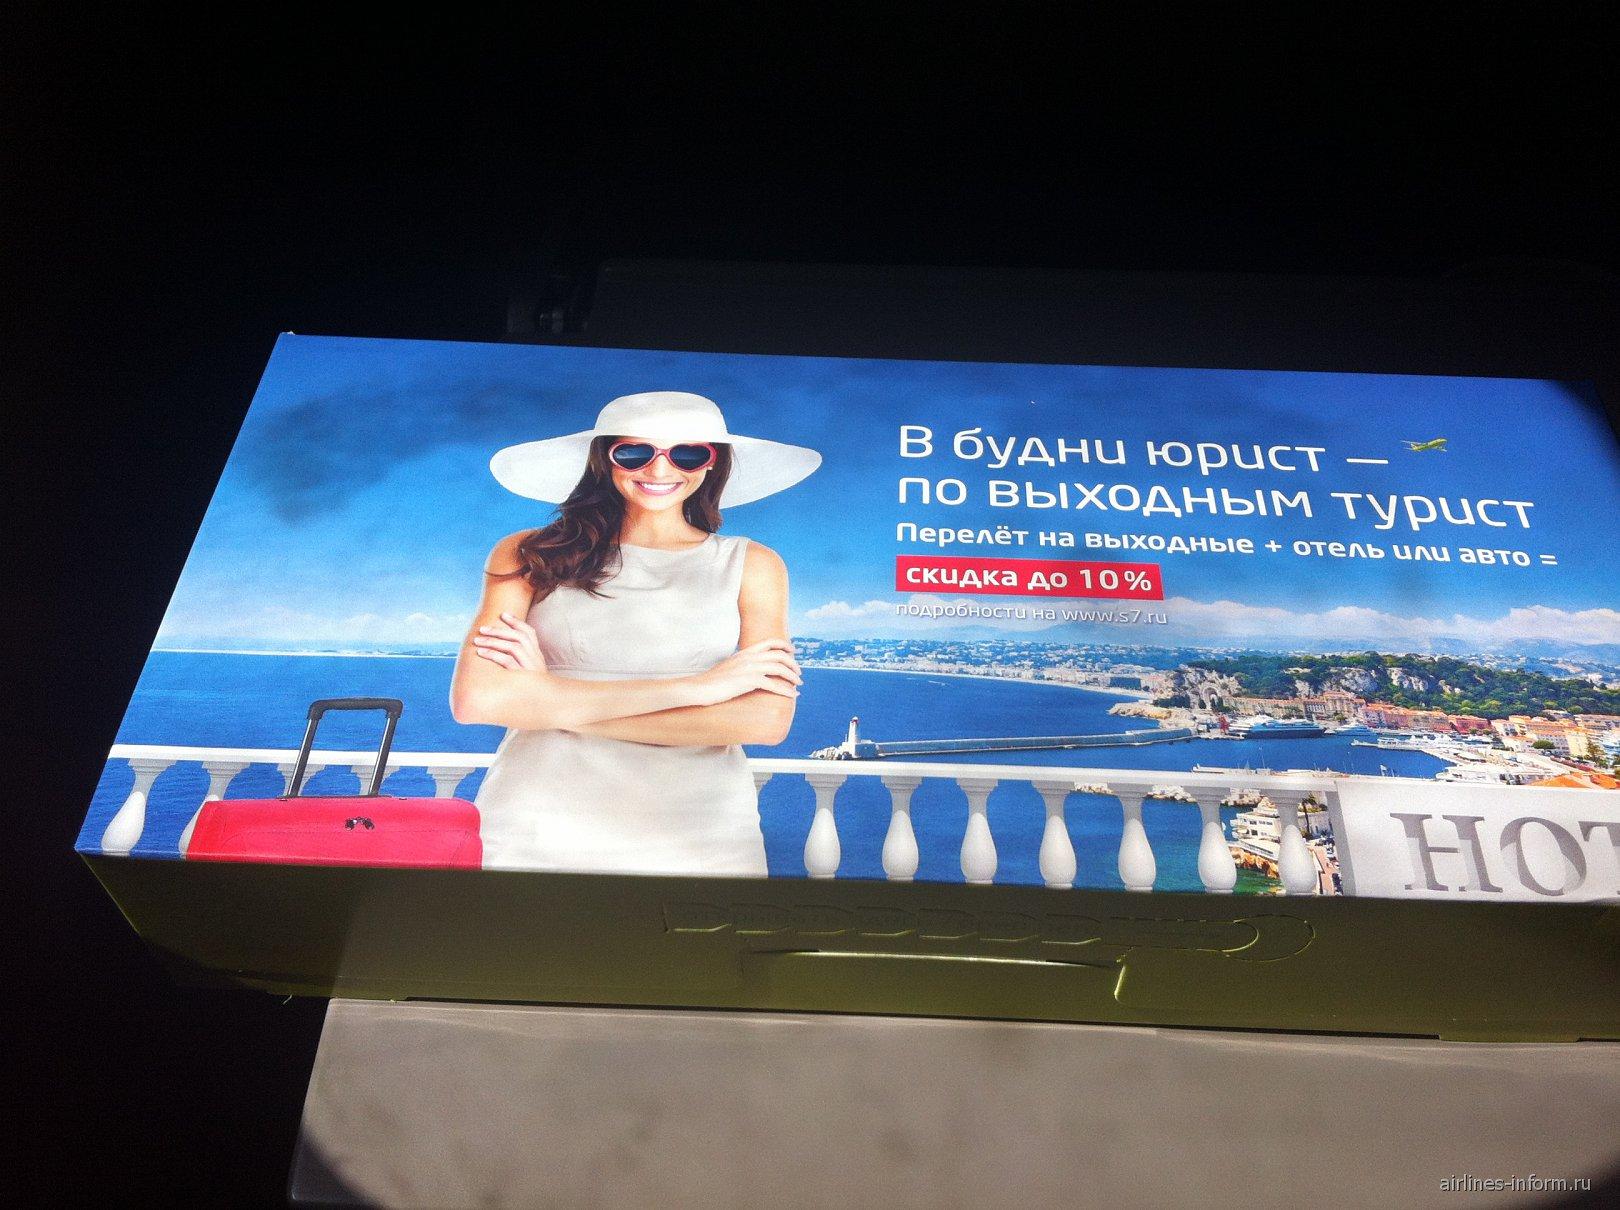 Питание на рейсе Владикавказ-Москва авиакомпании S7 Airlines